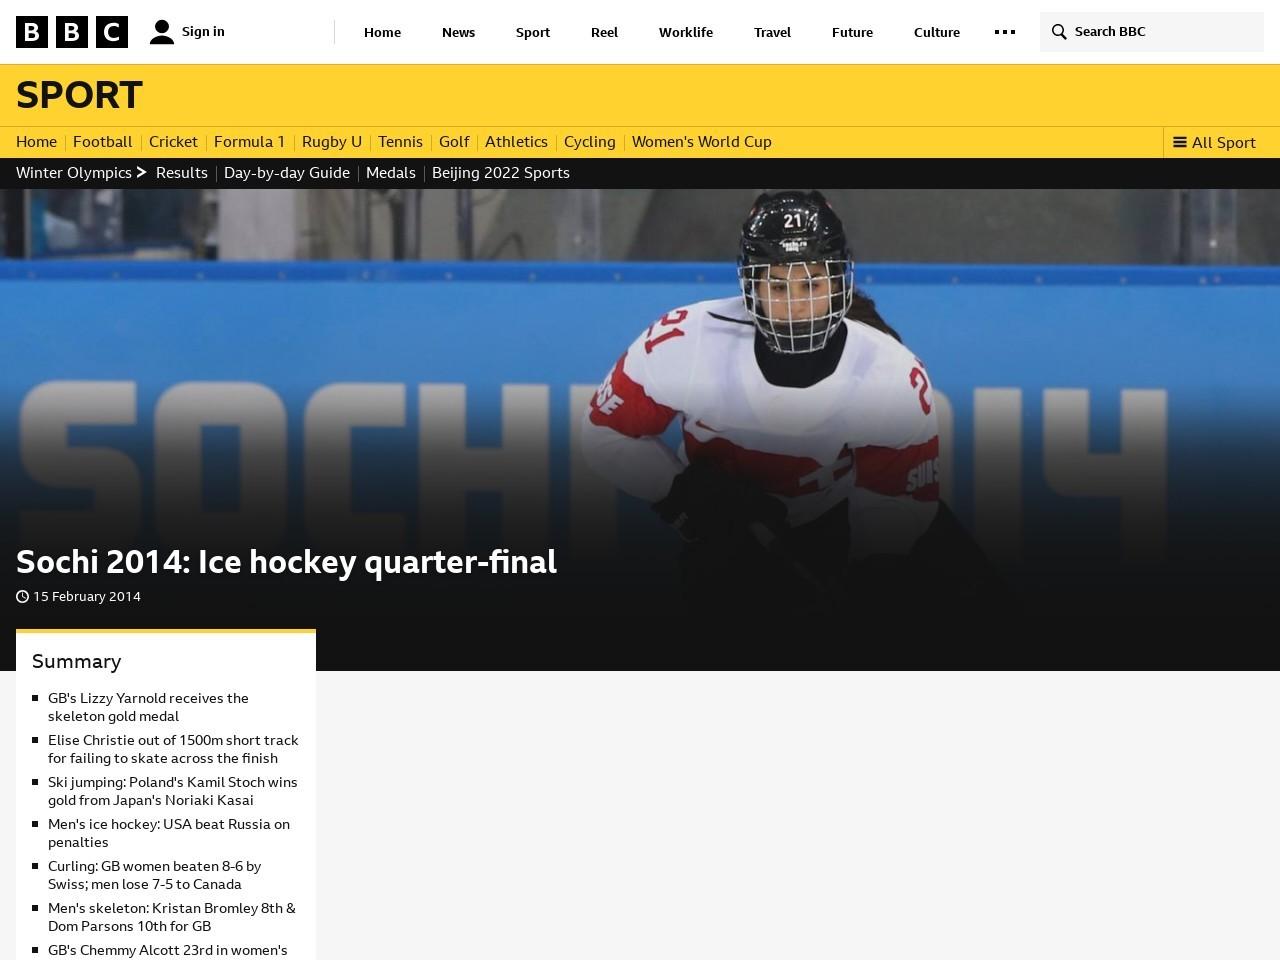 Sochi 2014: Ice hockey quarter-final